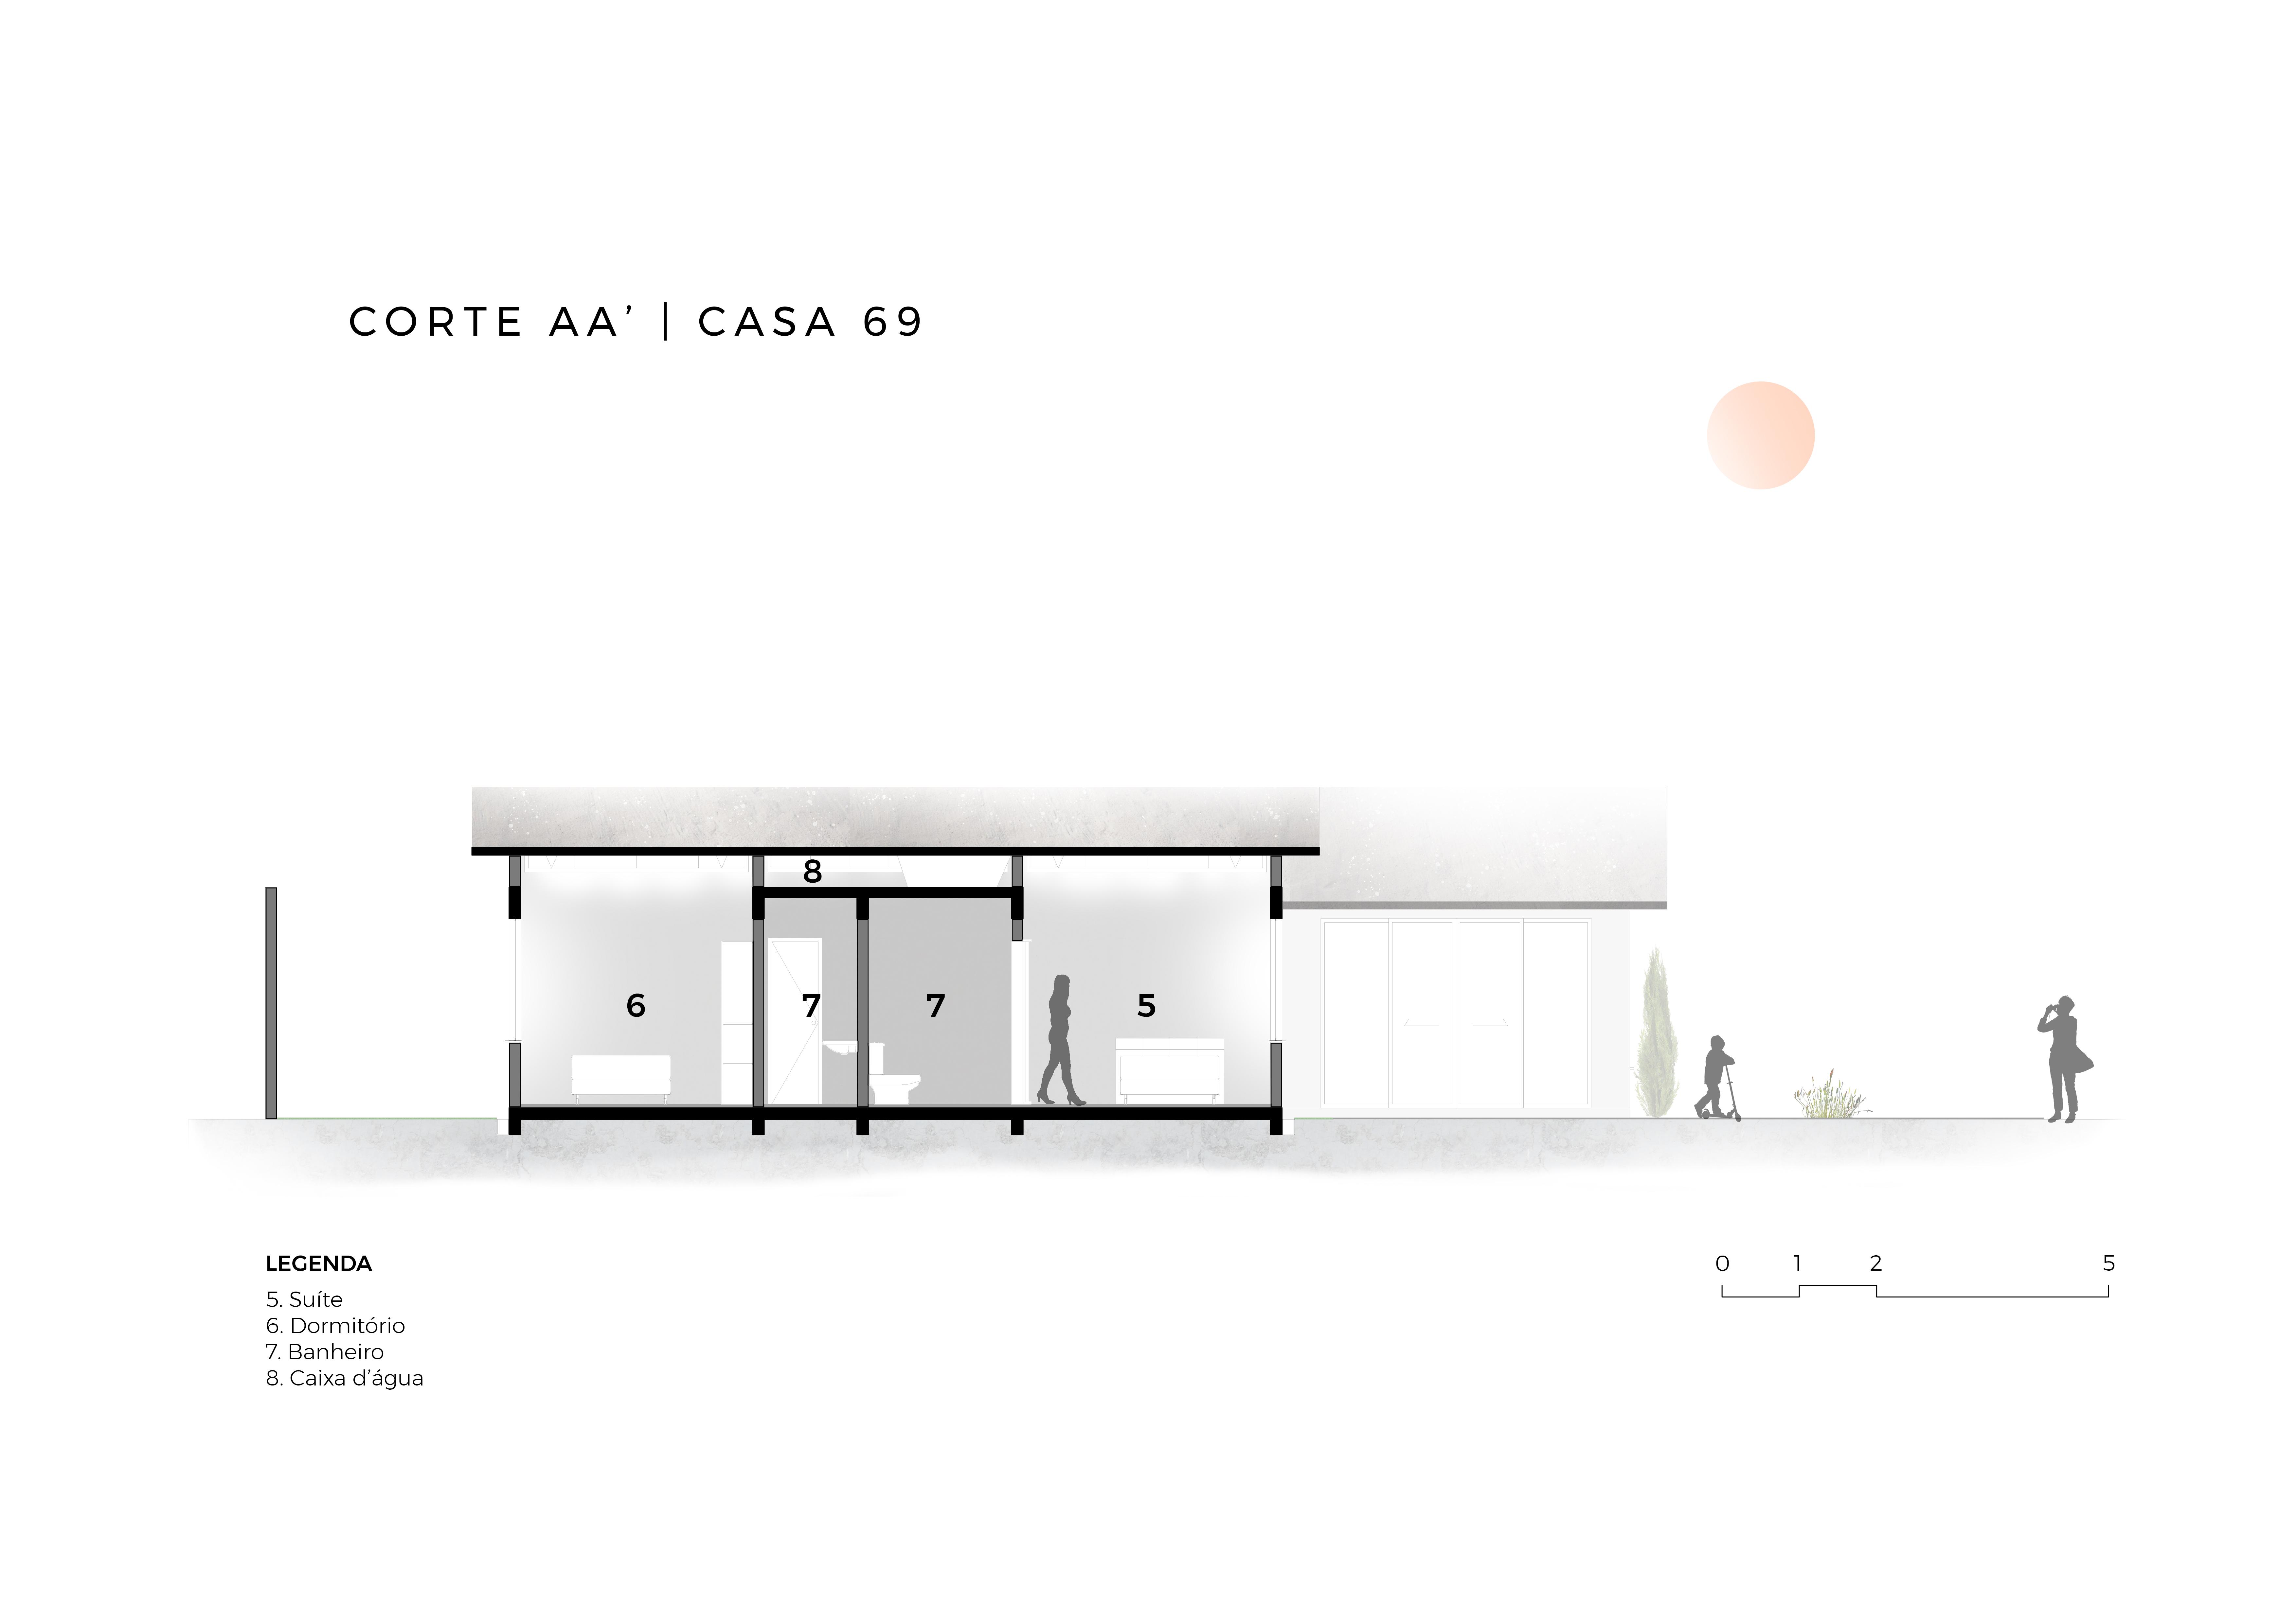 CASA69 - Corte AA'